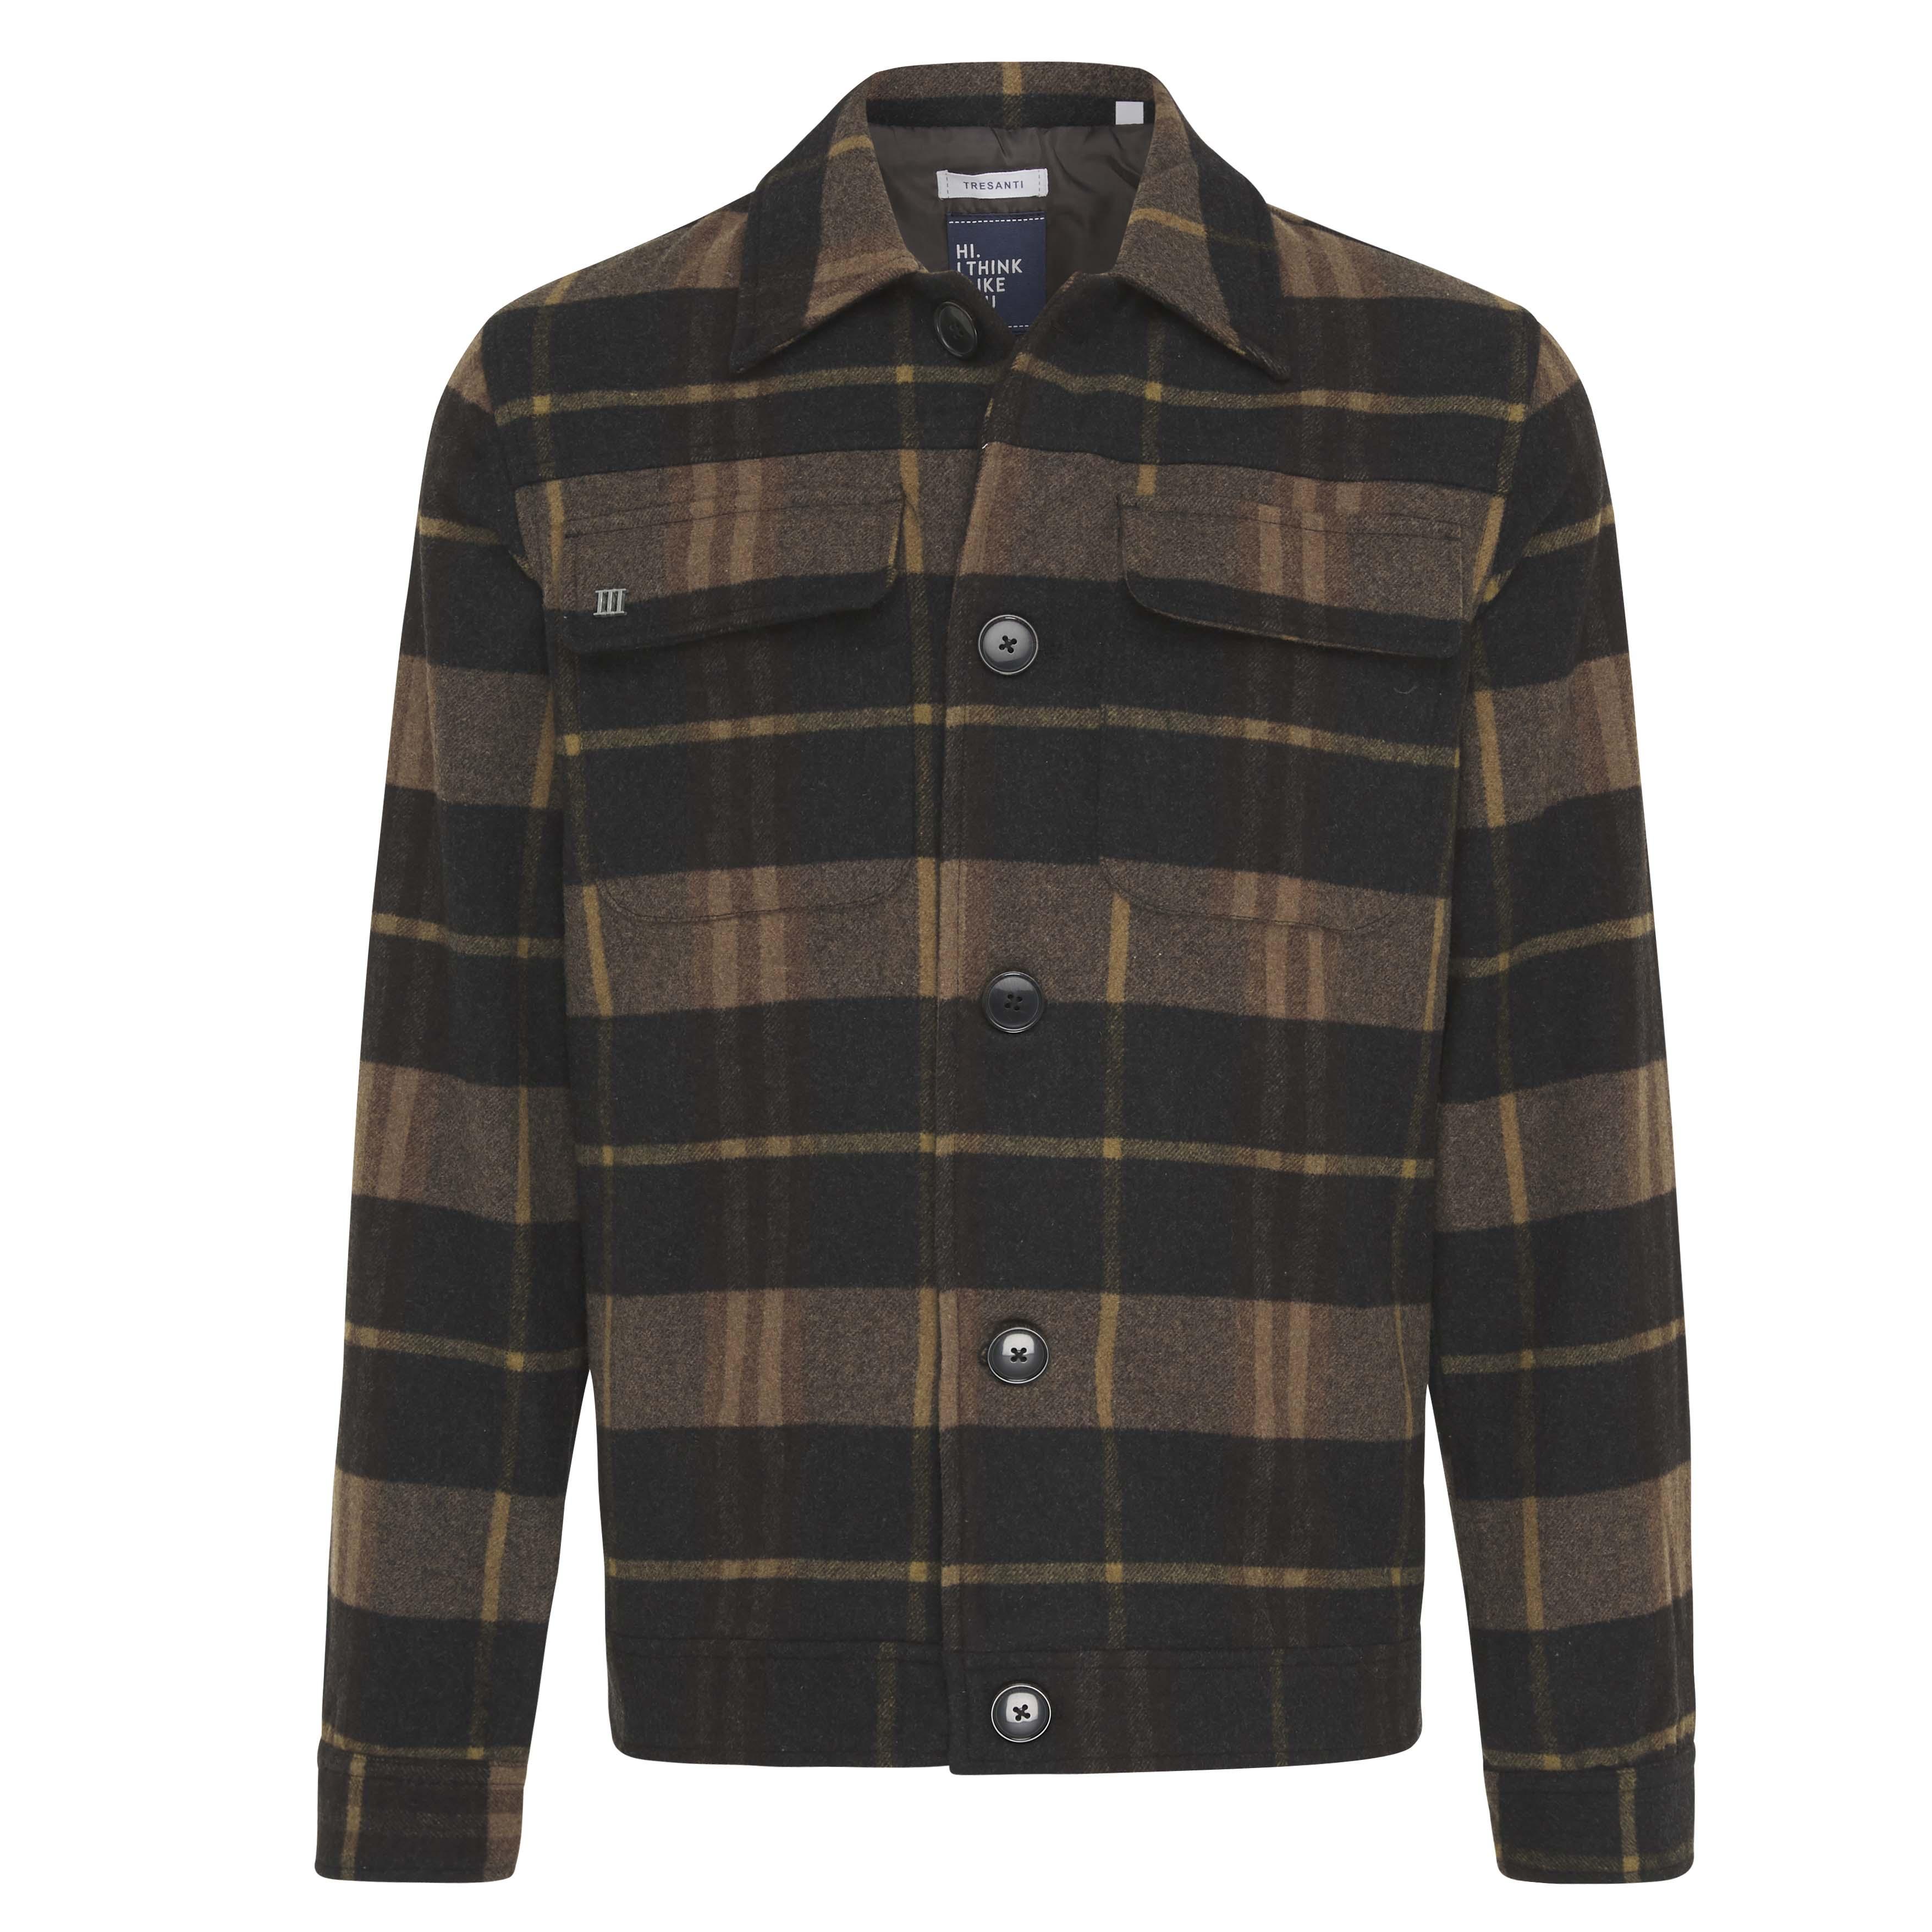 Jay | Jacket check wool blend brown